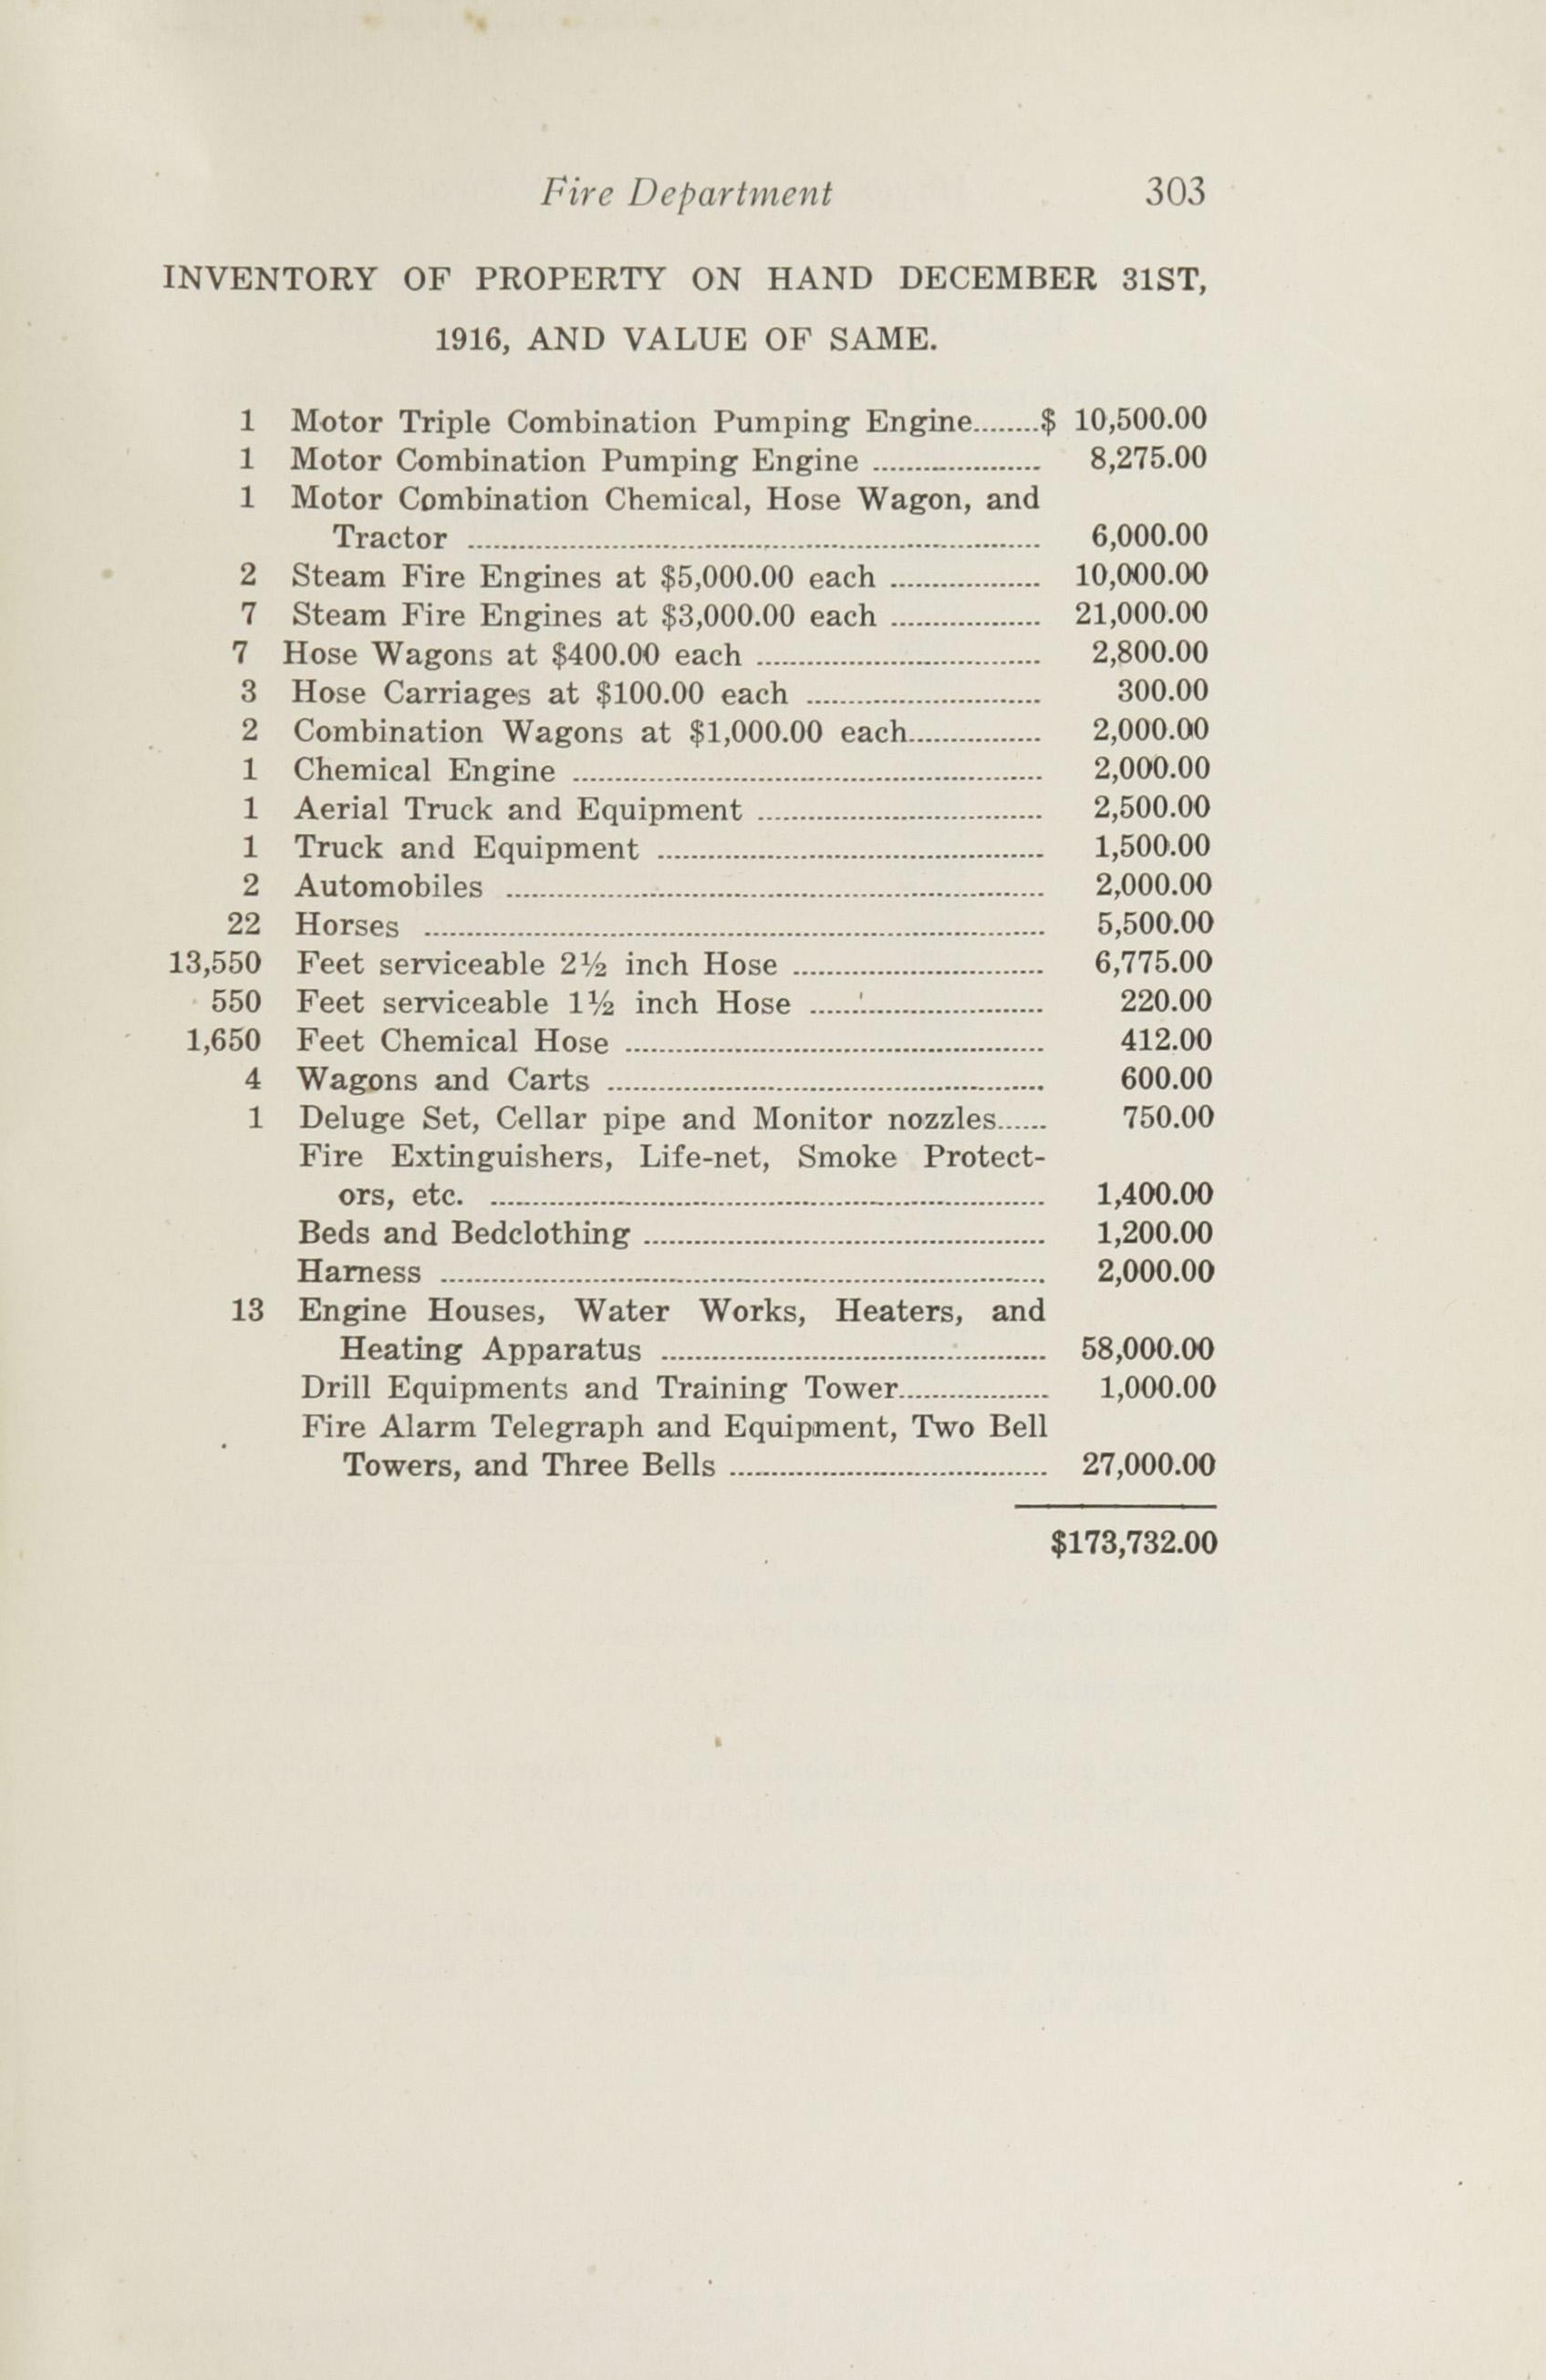 Charleston Yearbook, 1916, page 303